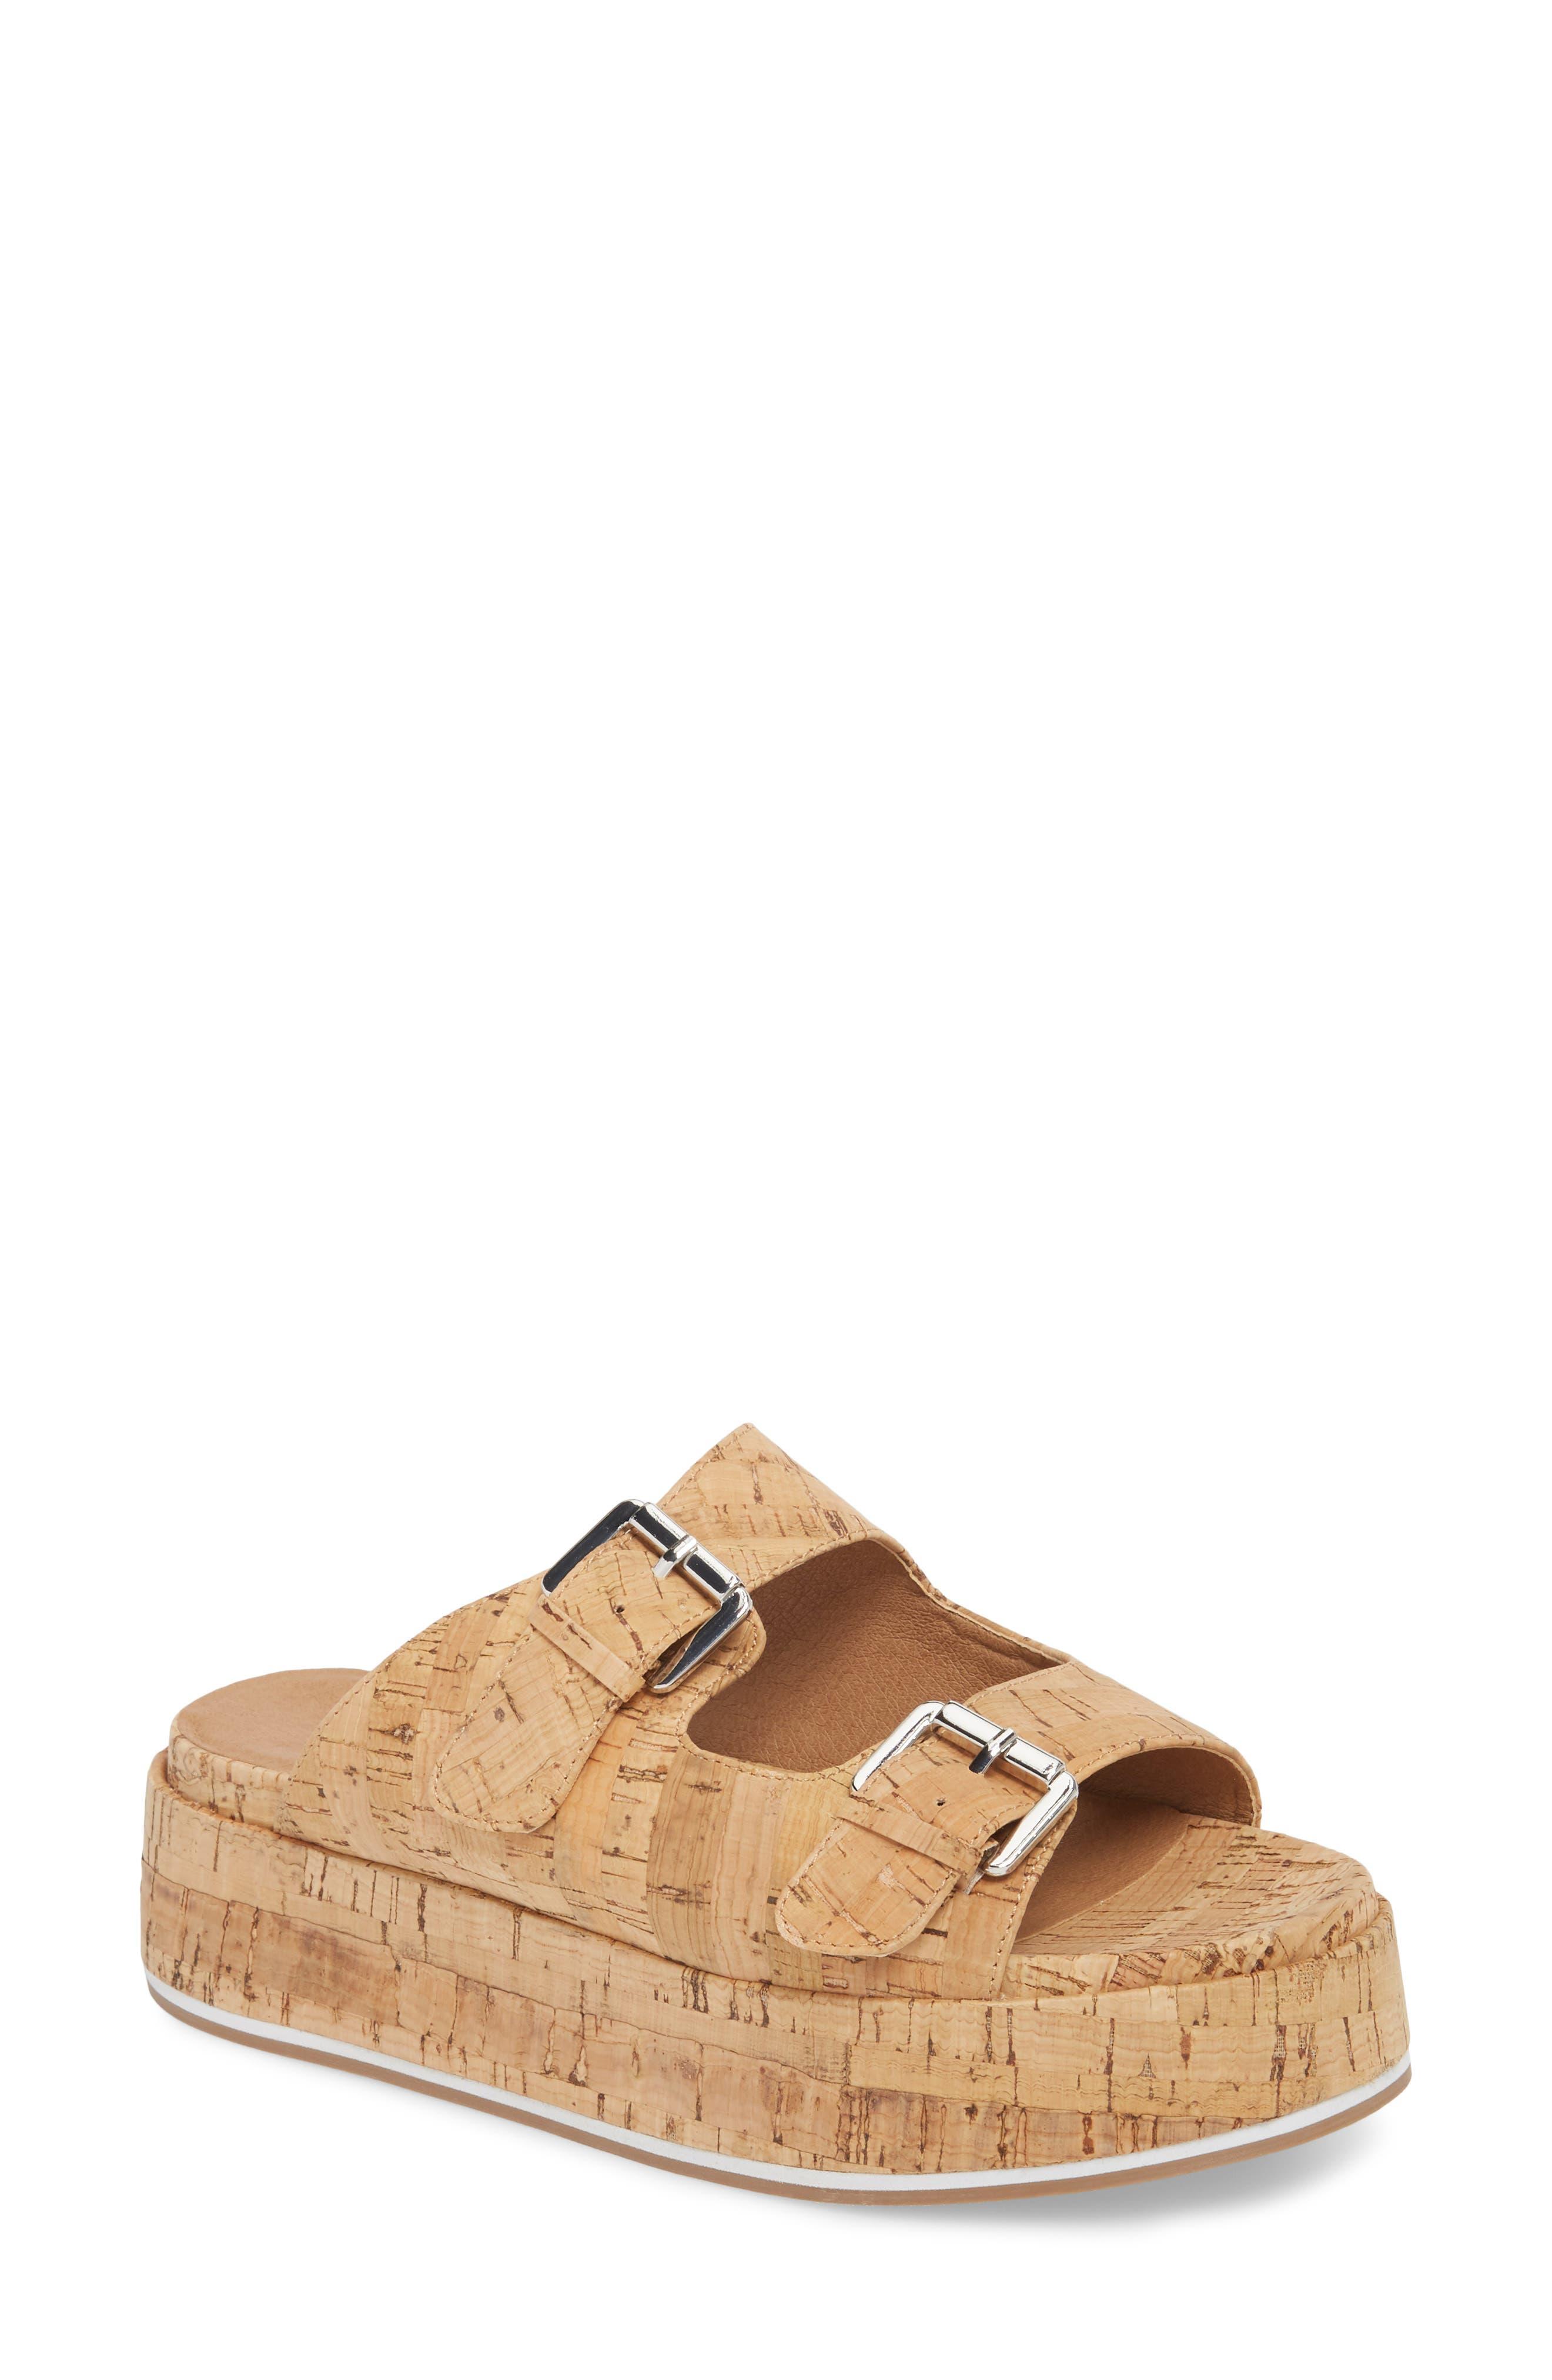 Jordan Two-Buckle Slide Sandal,                         Main,                         color, Cork